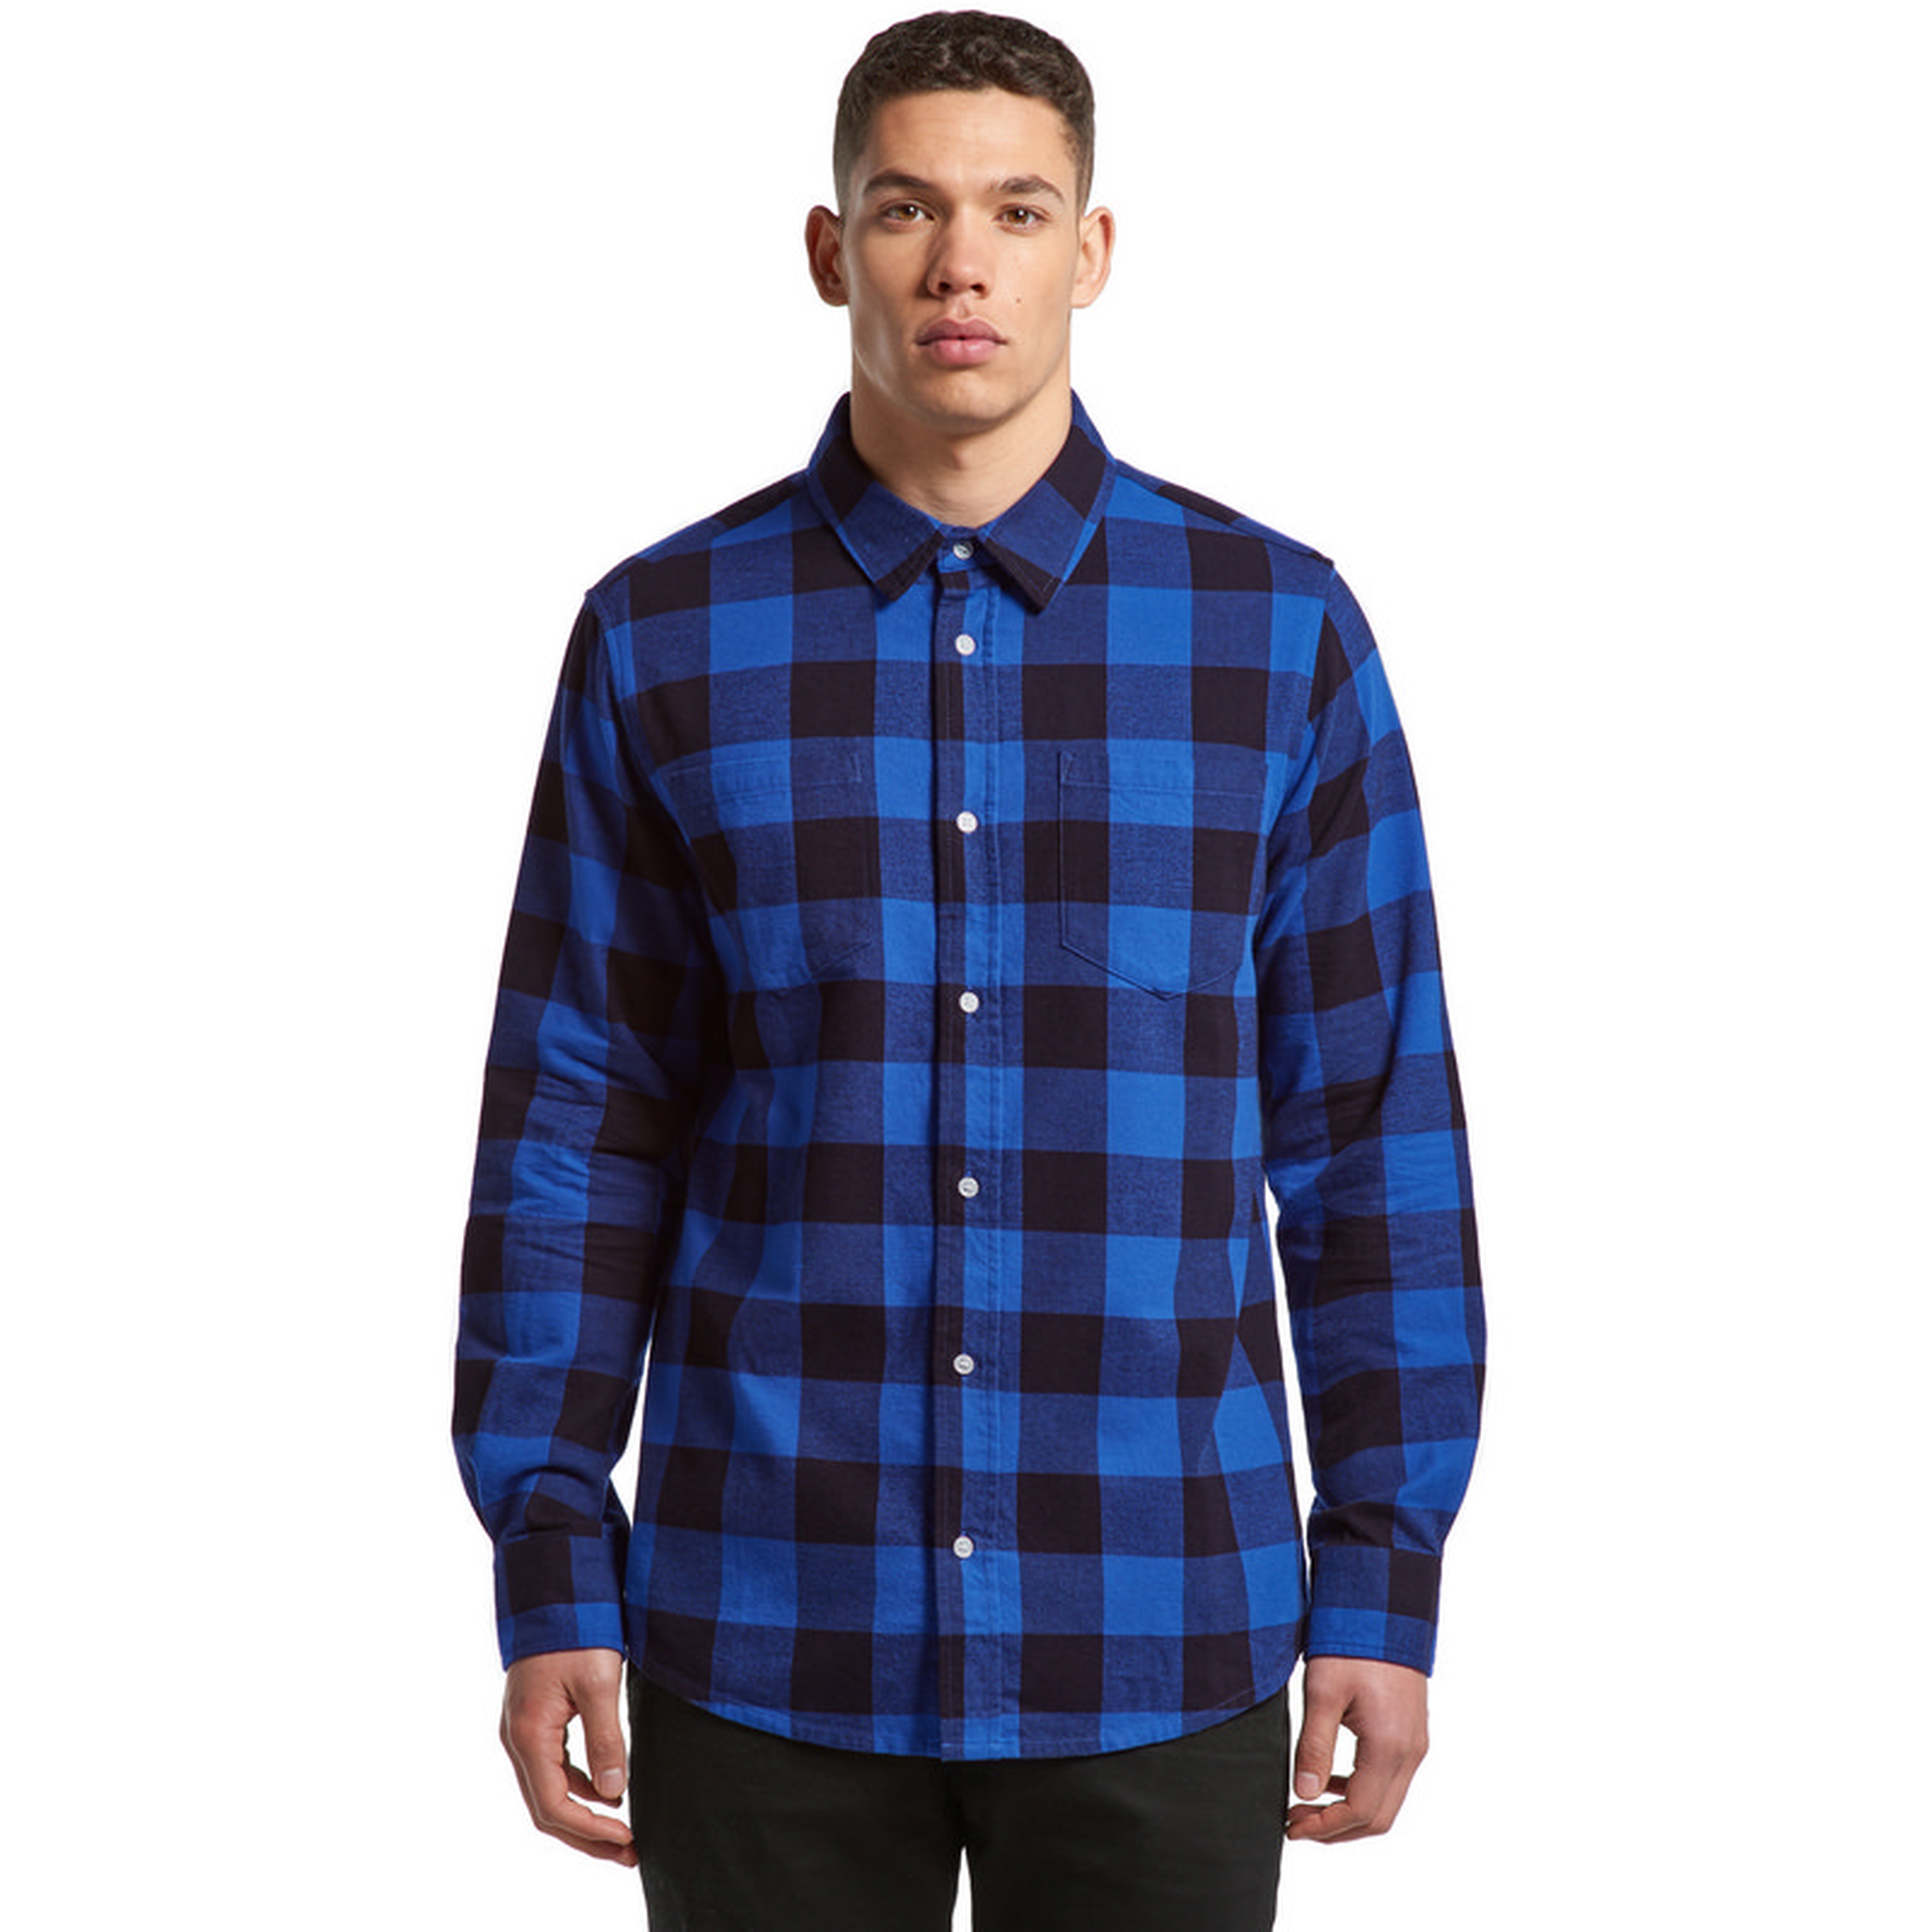 AS Colour Check Shirt